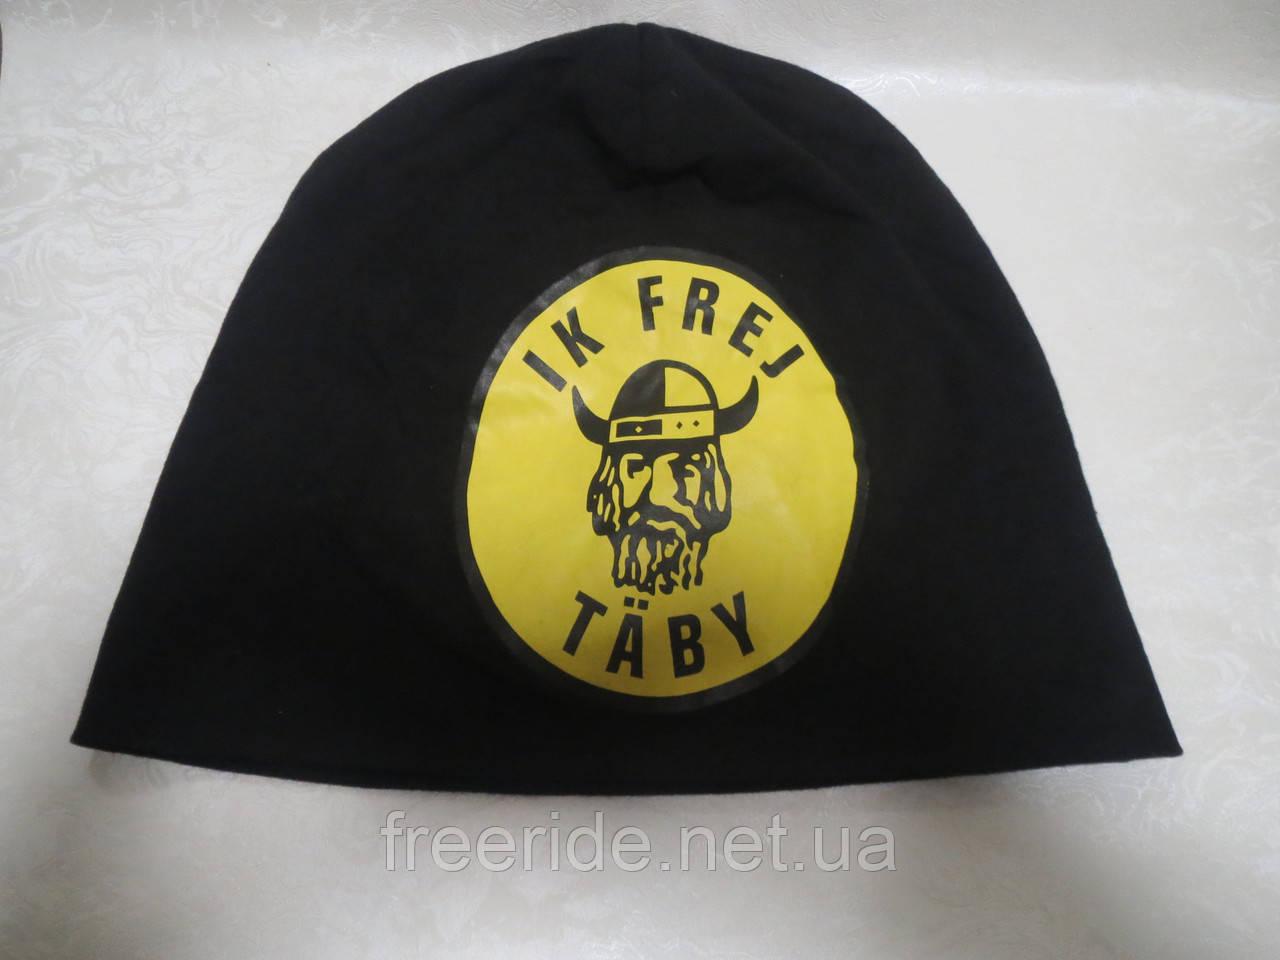 Удлиненная шапочка Ik Frej Taby для бега или вело